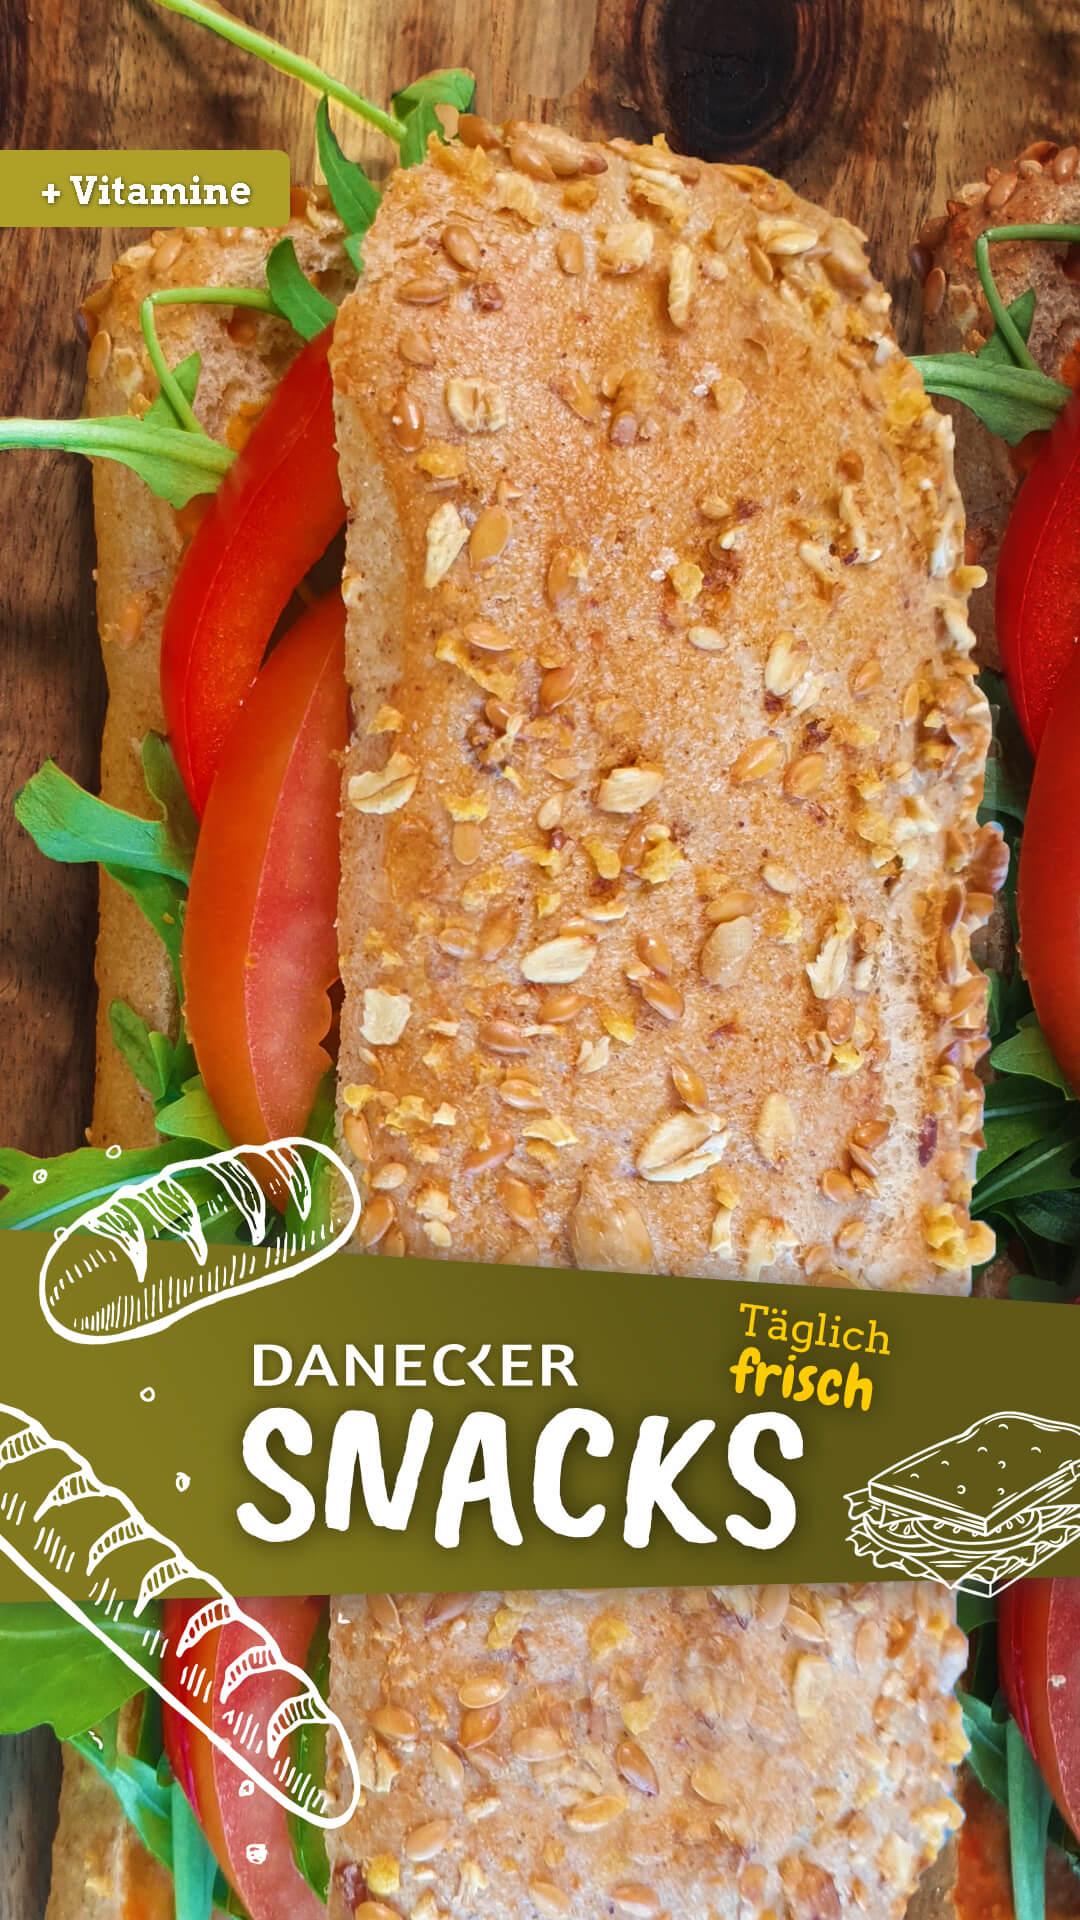 Snacks Jause Danecker Bäckerei Konditorei Amstetten Bahnhof, Allersdorf, Greinsfurth, Perg, Linz, Wallsee, Aschbach, Mauer vegan